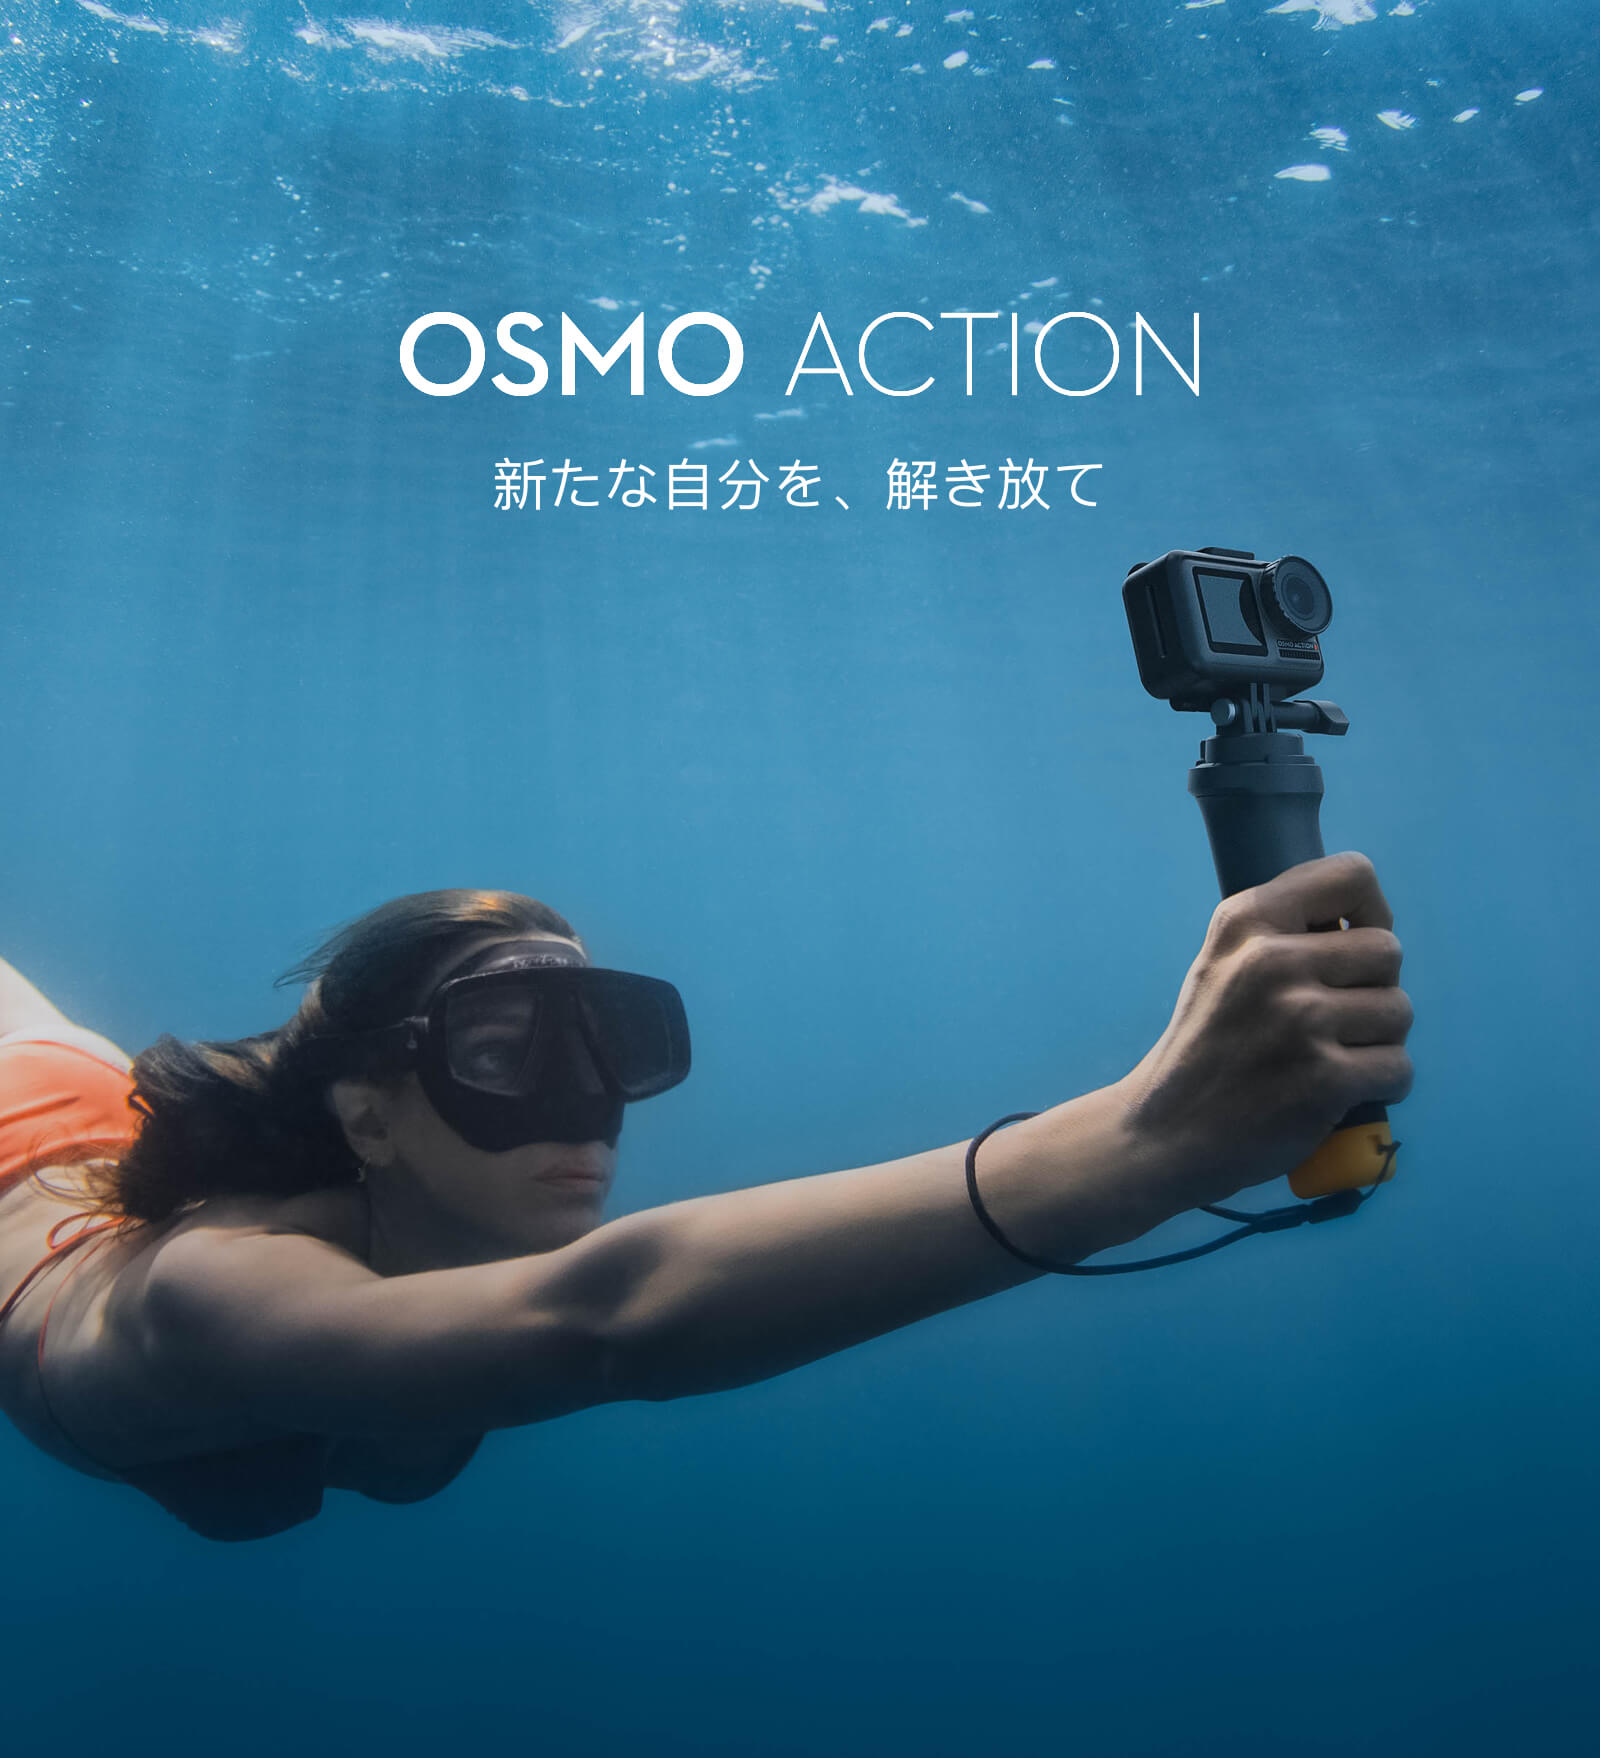 https://www.drone-station.net/images/DJI/osmoaction/01action.jpg